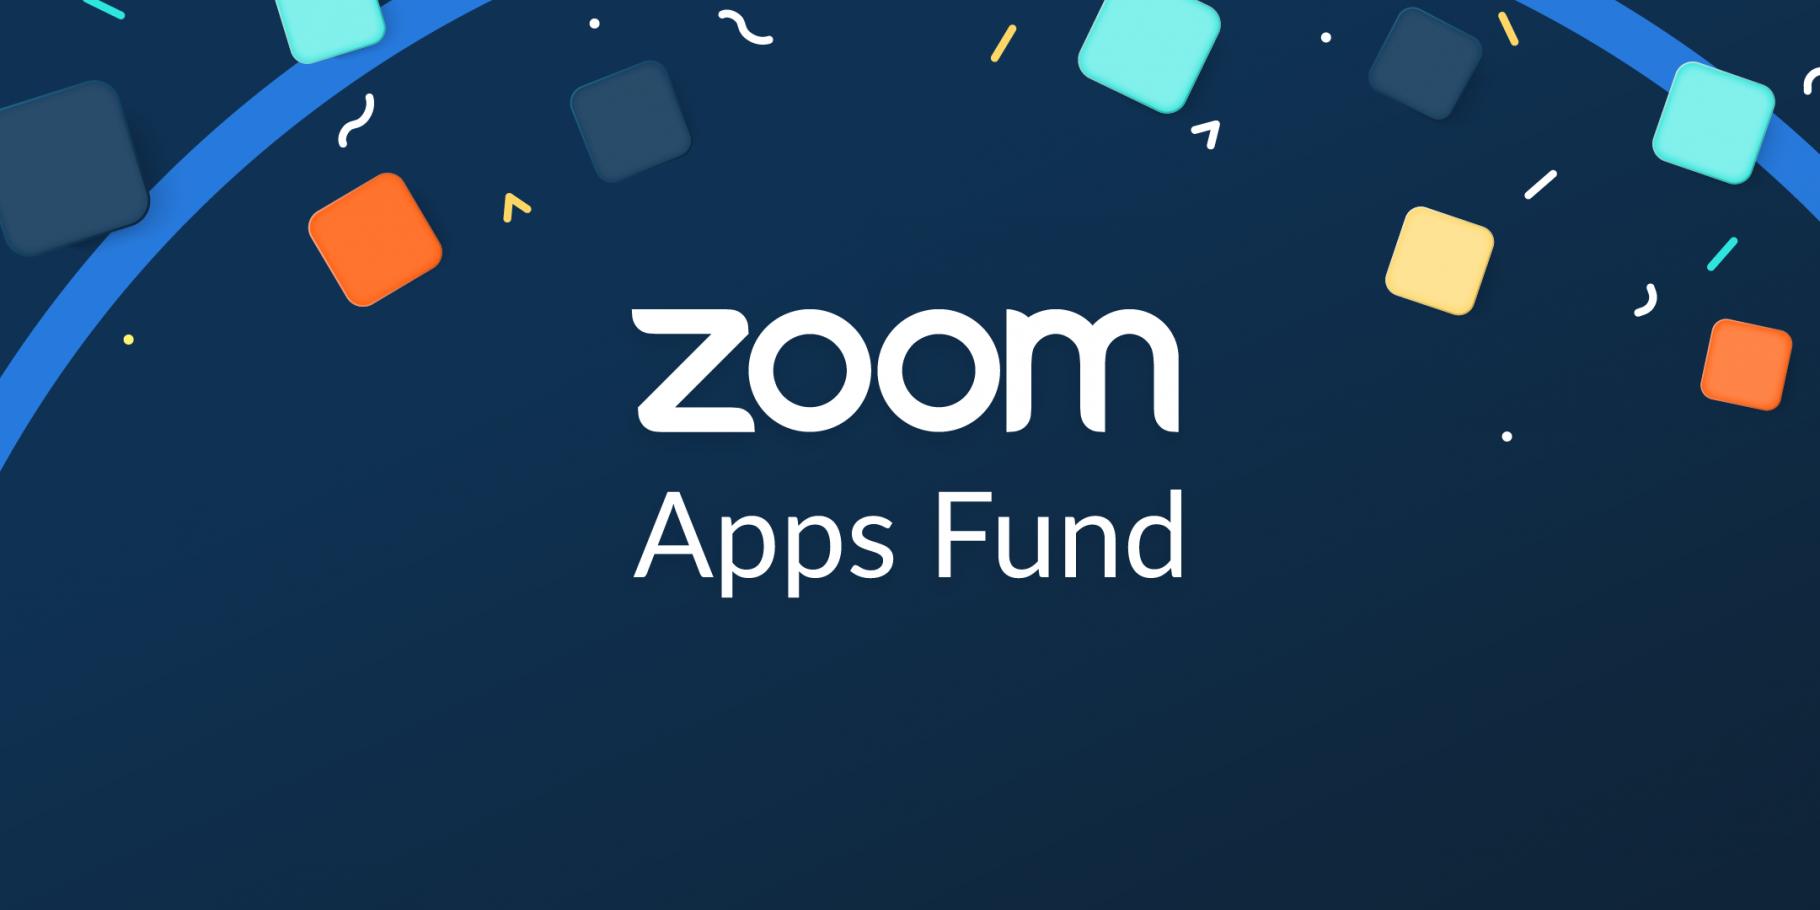 Zoom 宣布提供 1 億美元 Zoom Apps Fund 基金